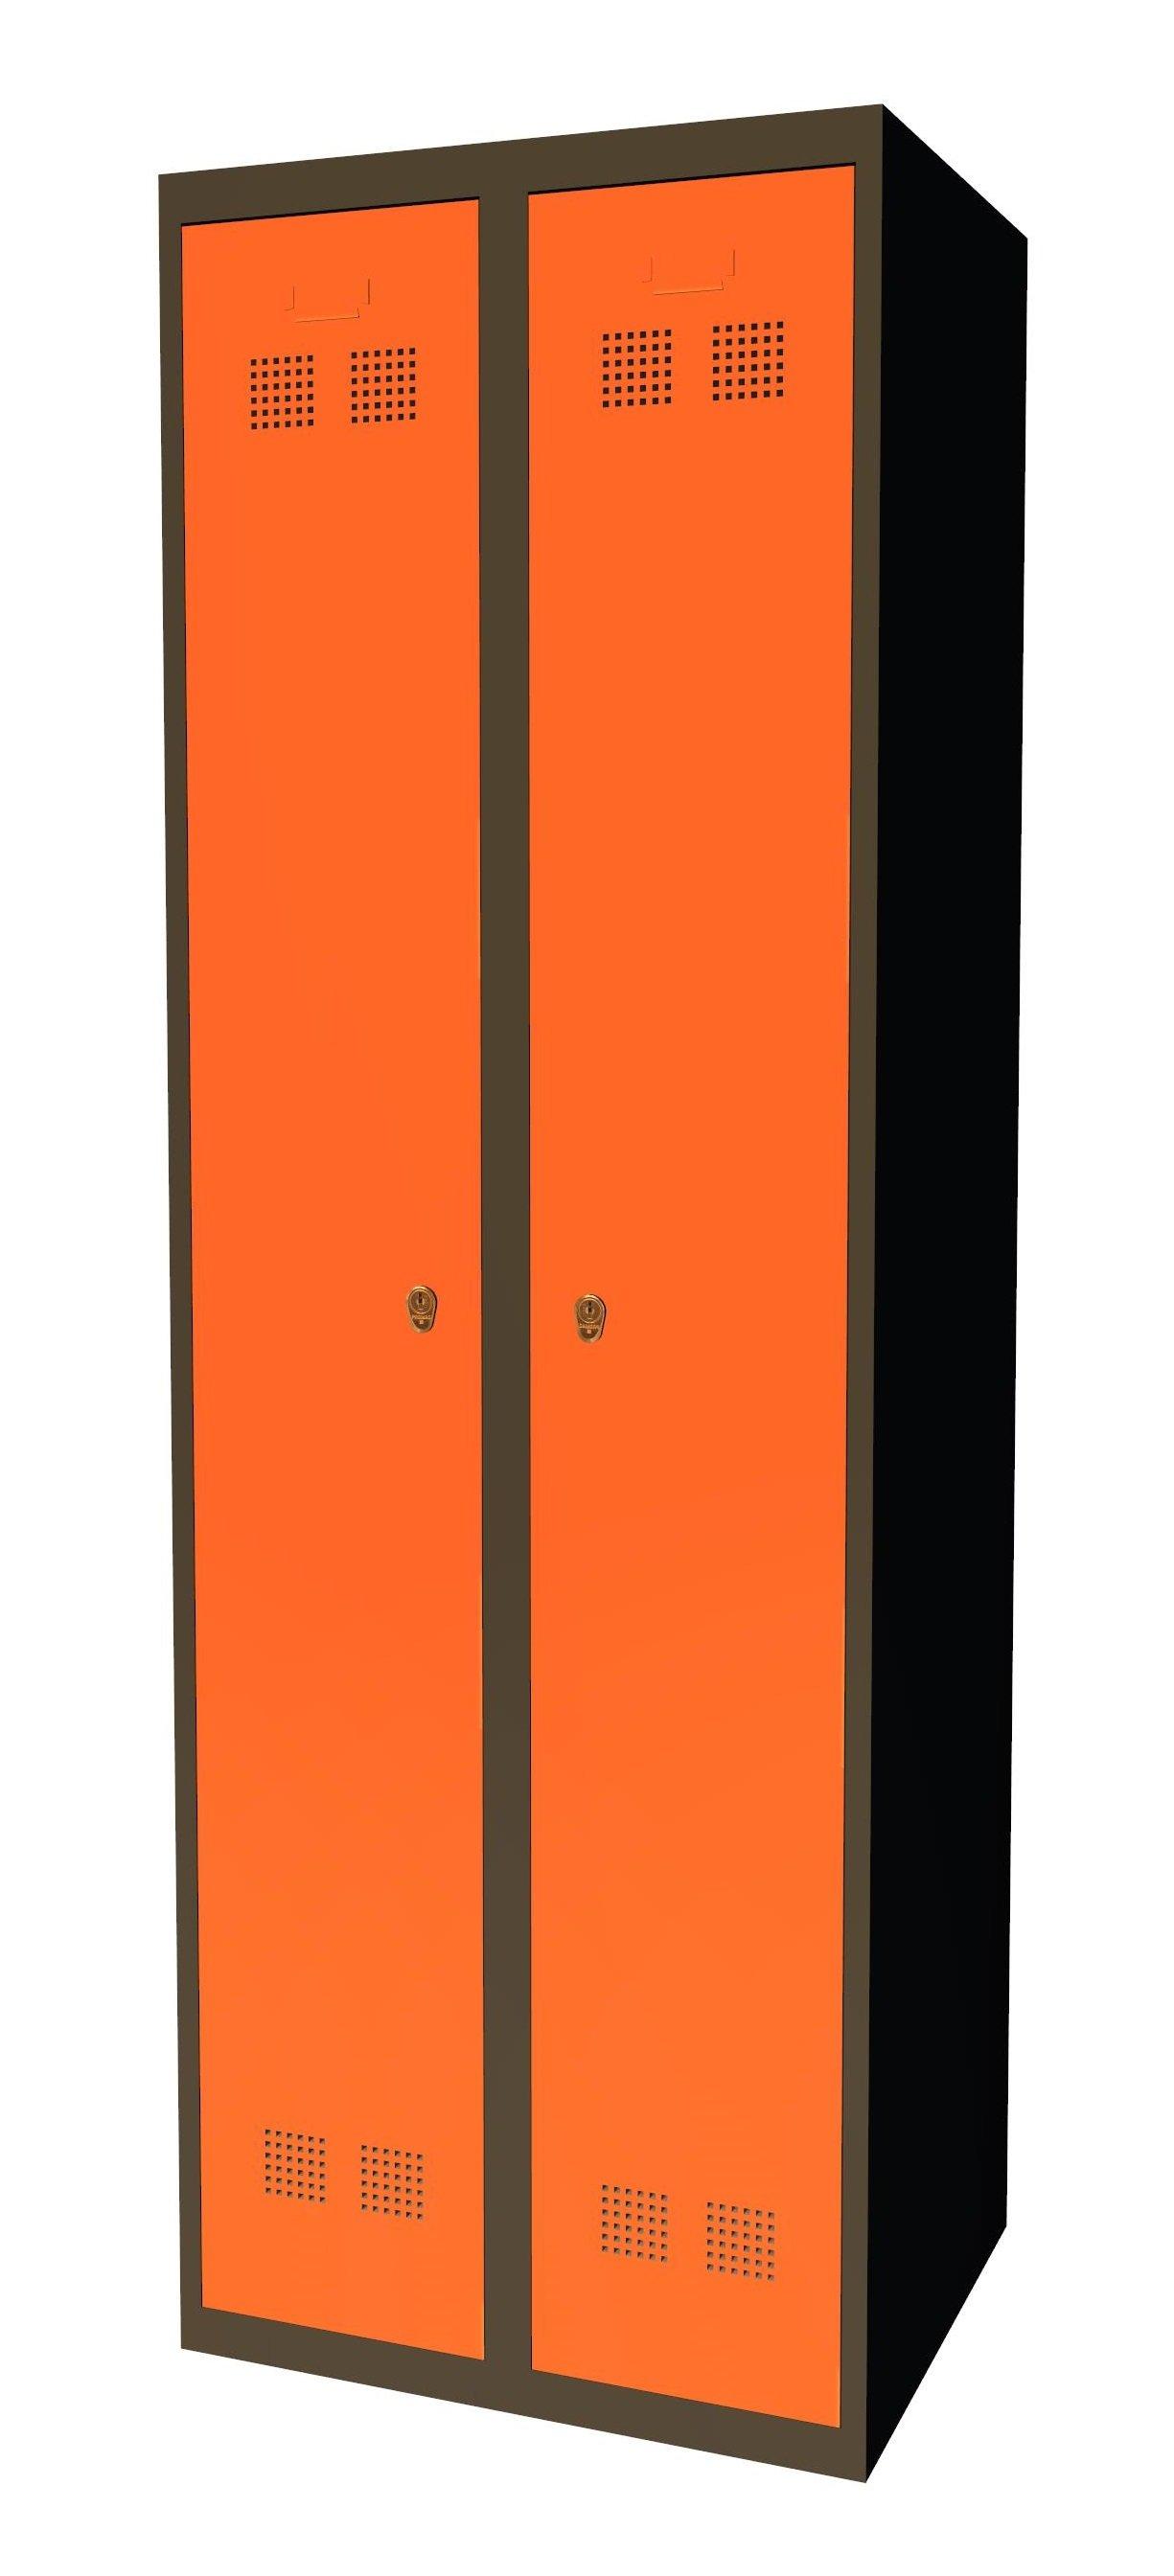 Szafka pracownicza SUP E300-02 7024/2003